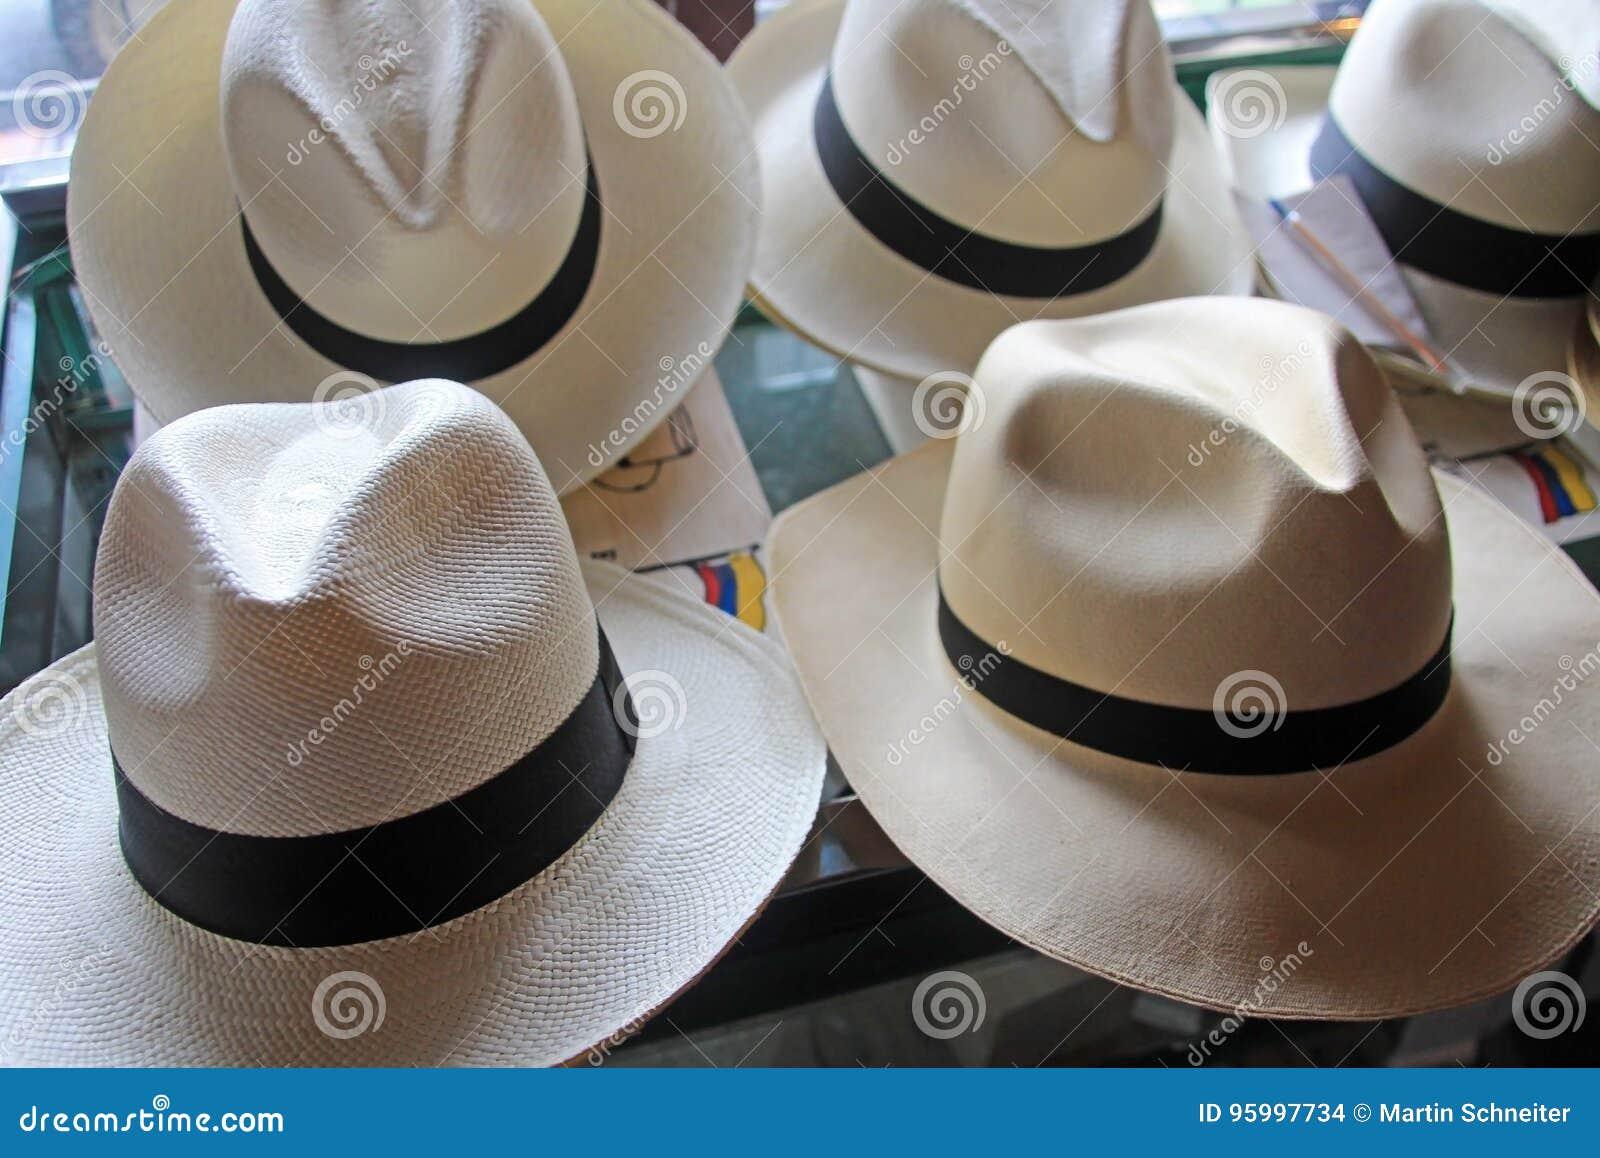 dddd2c9da7c61 Panama Straw Hat Grades Showed At The Manufacterer